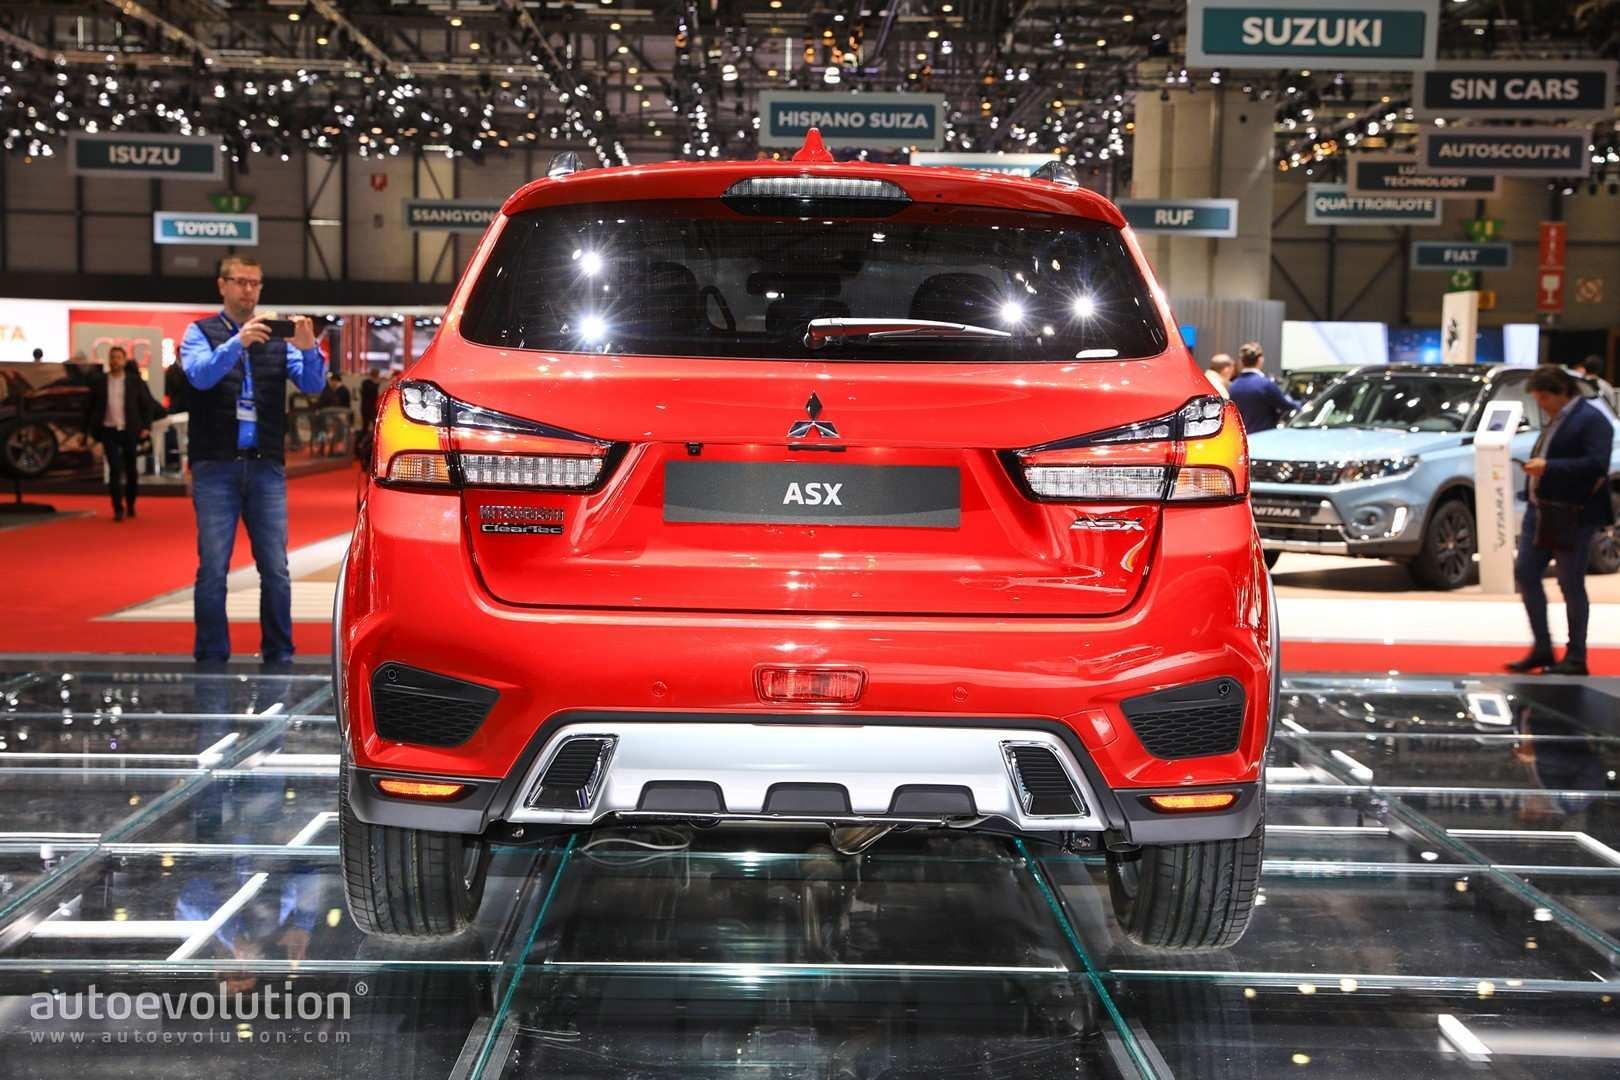 67 Gallery of Mitsubishi Asx 2020 Uk Pricing with Mitsubishi Asx 2020 Uk